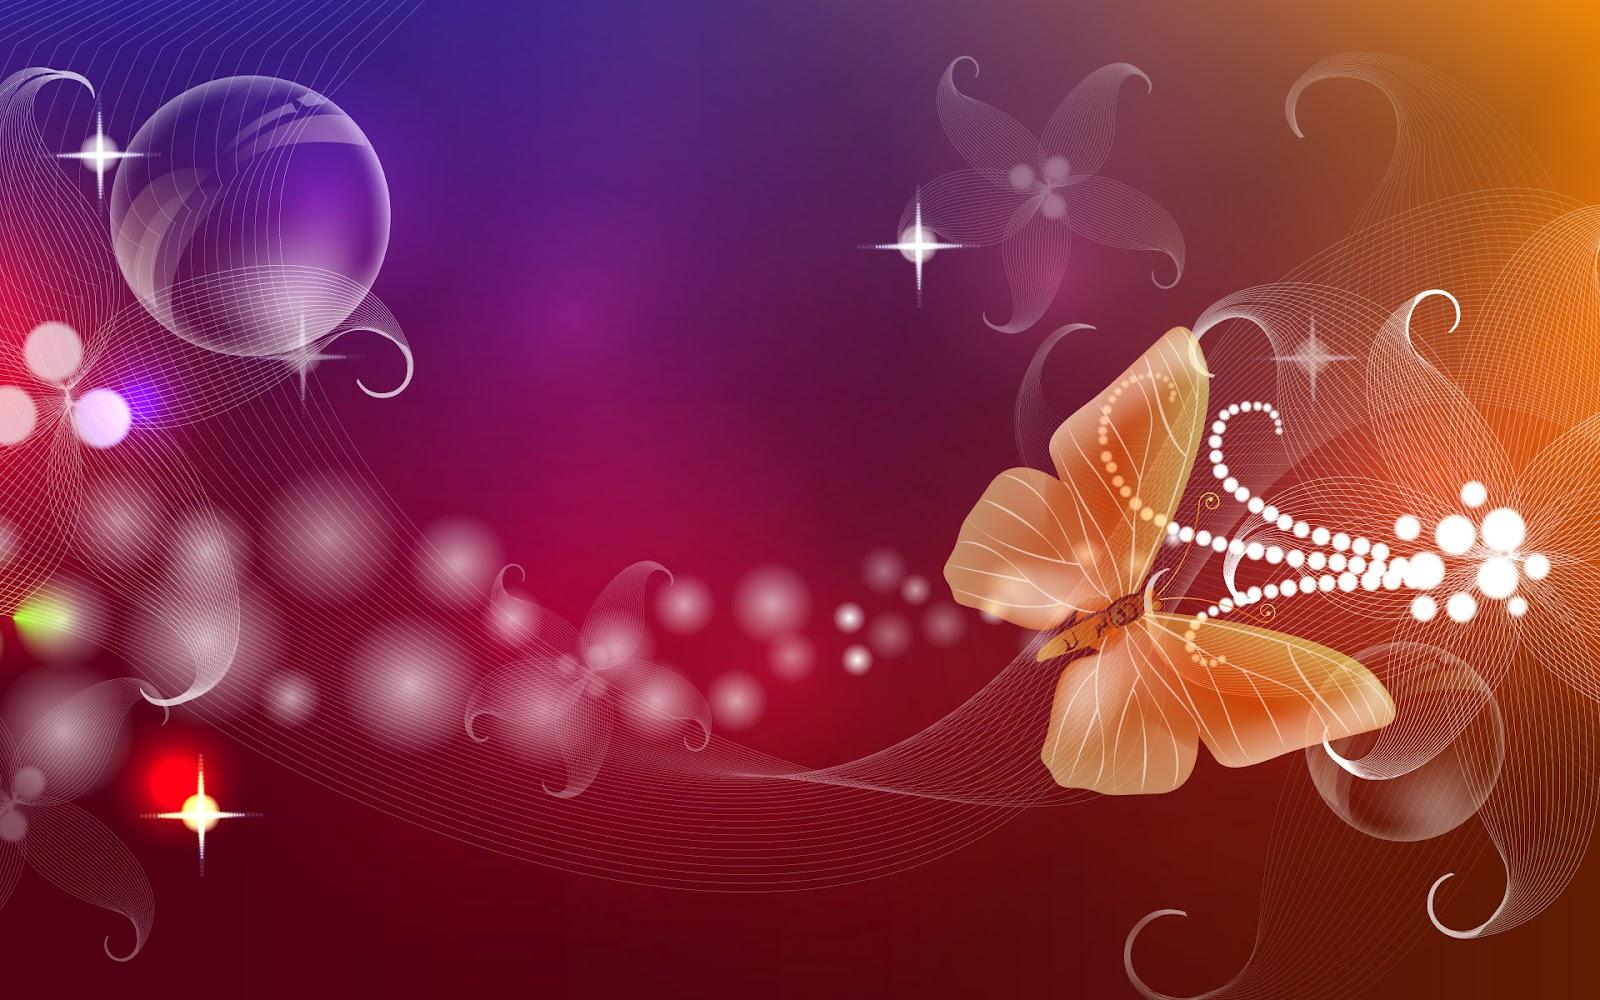 butterfly wallpaper design - photo #34